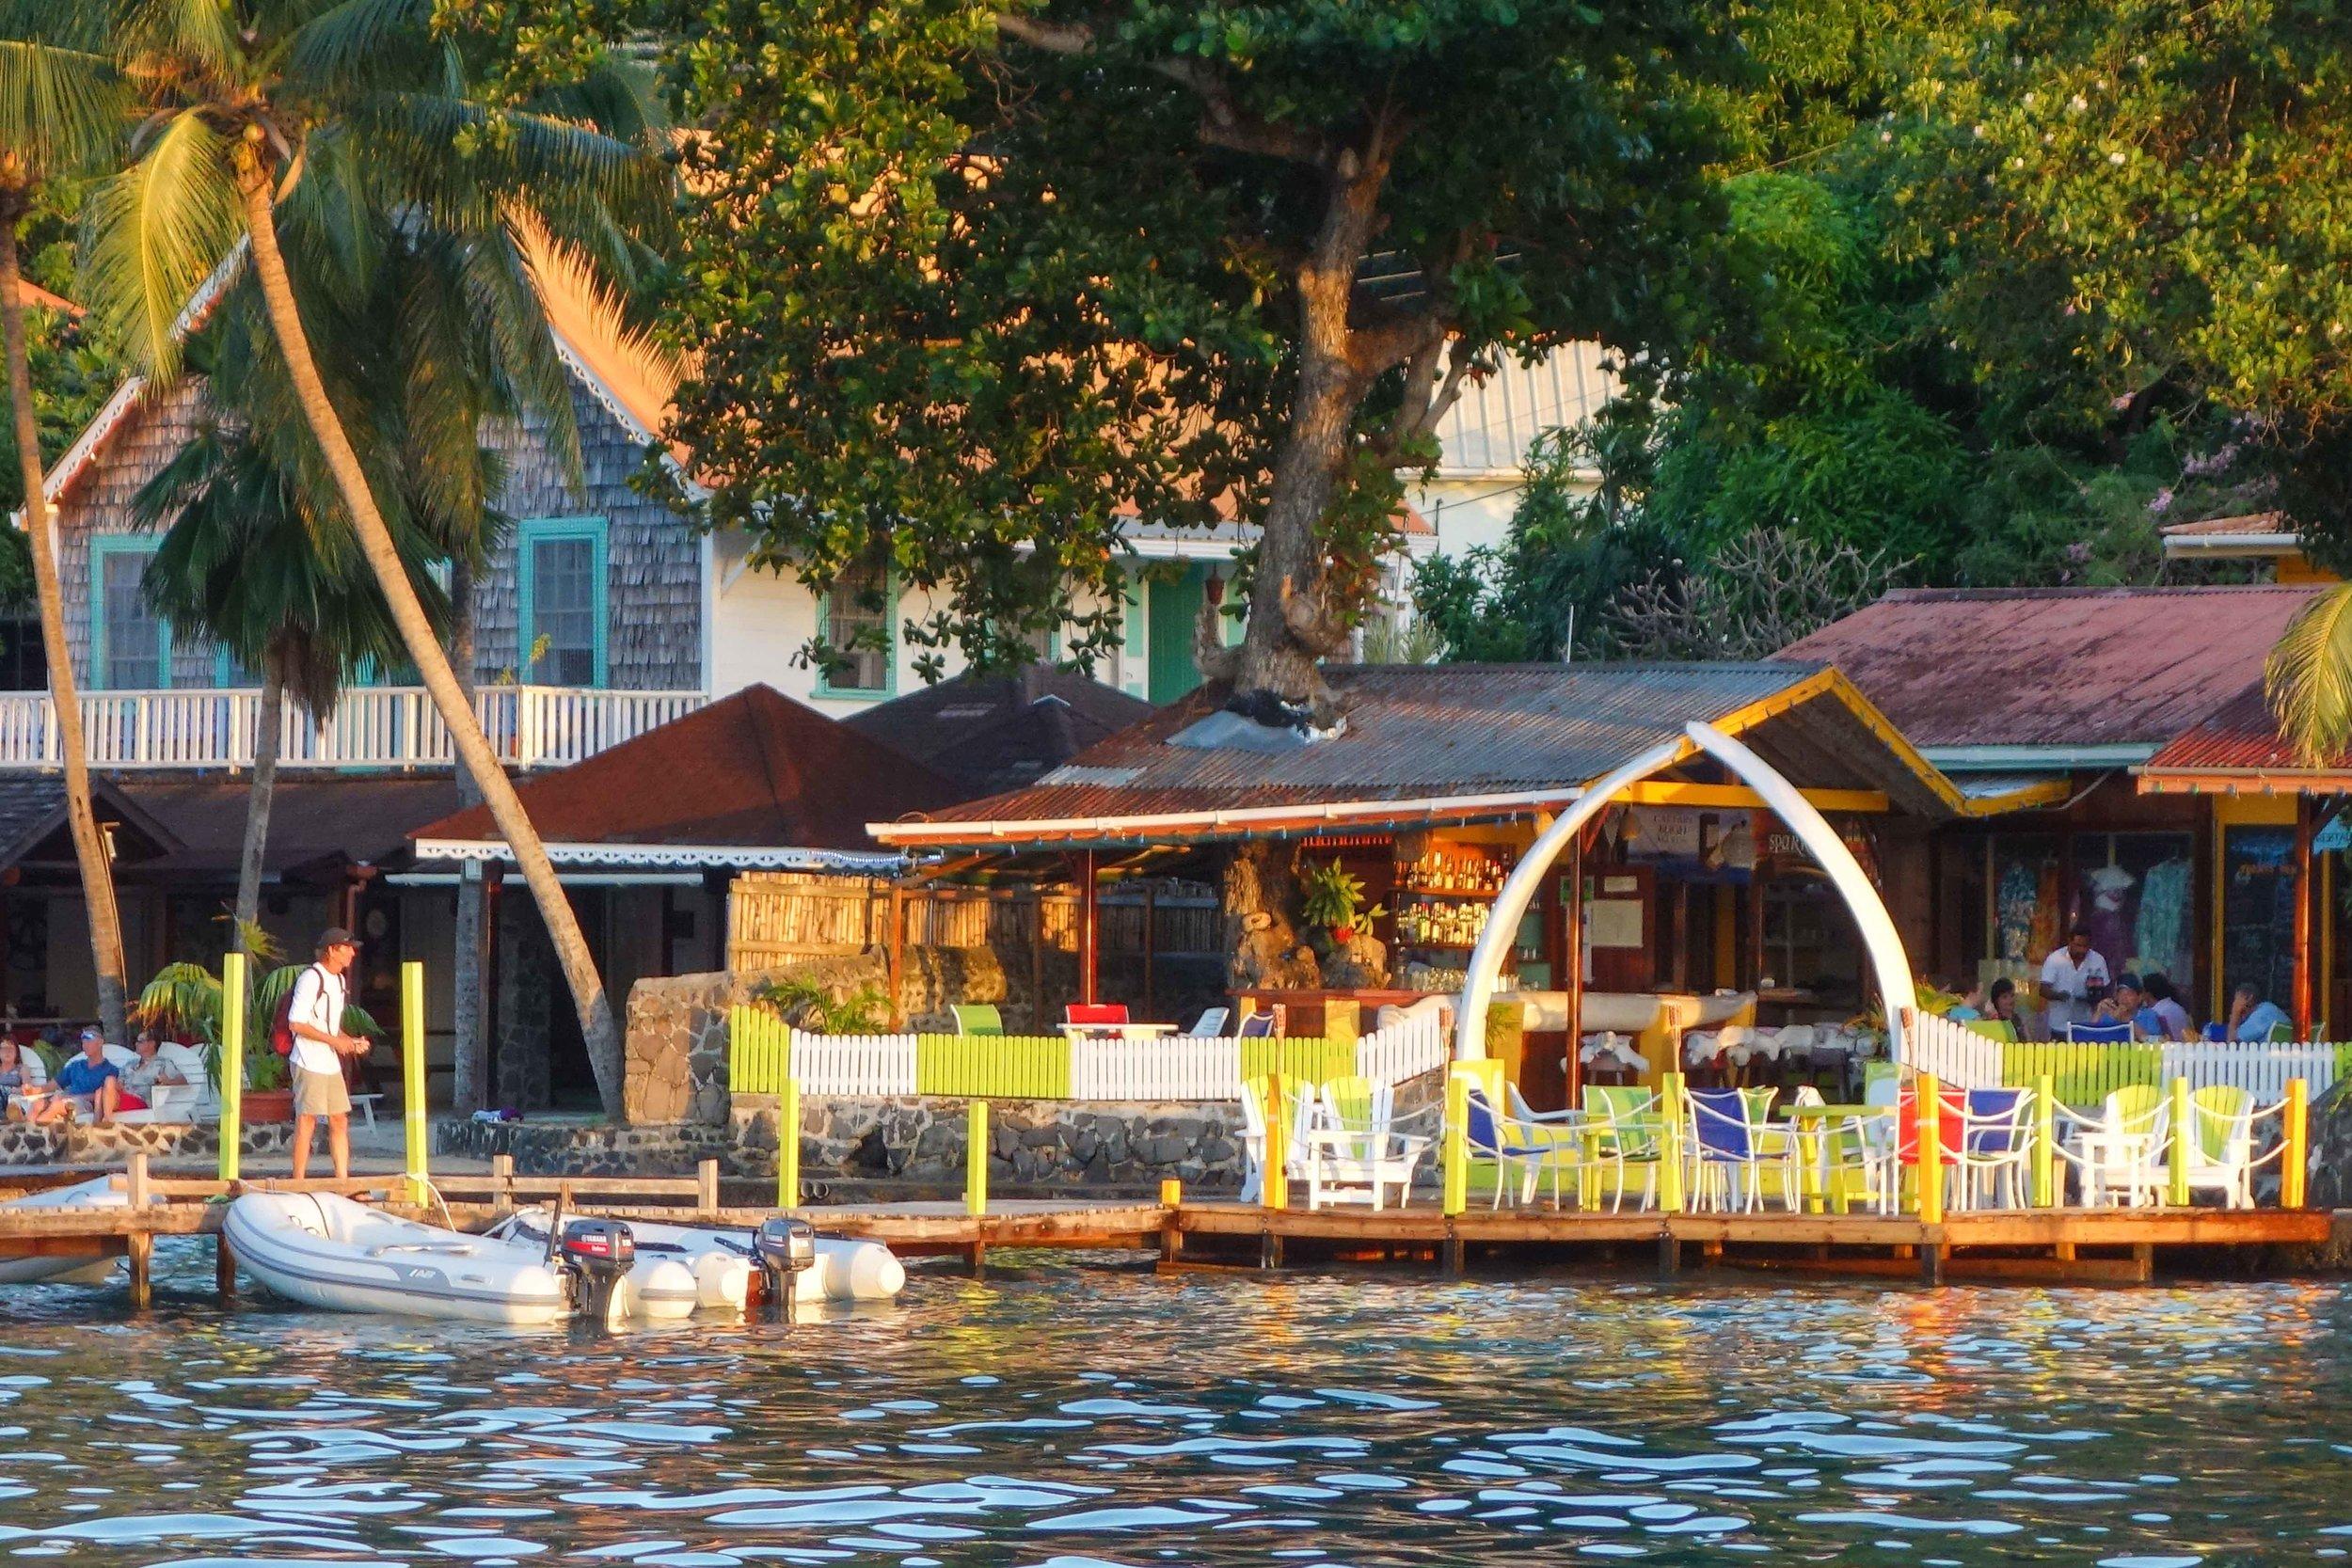 The Whaleboner Restaurant & Bar